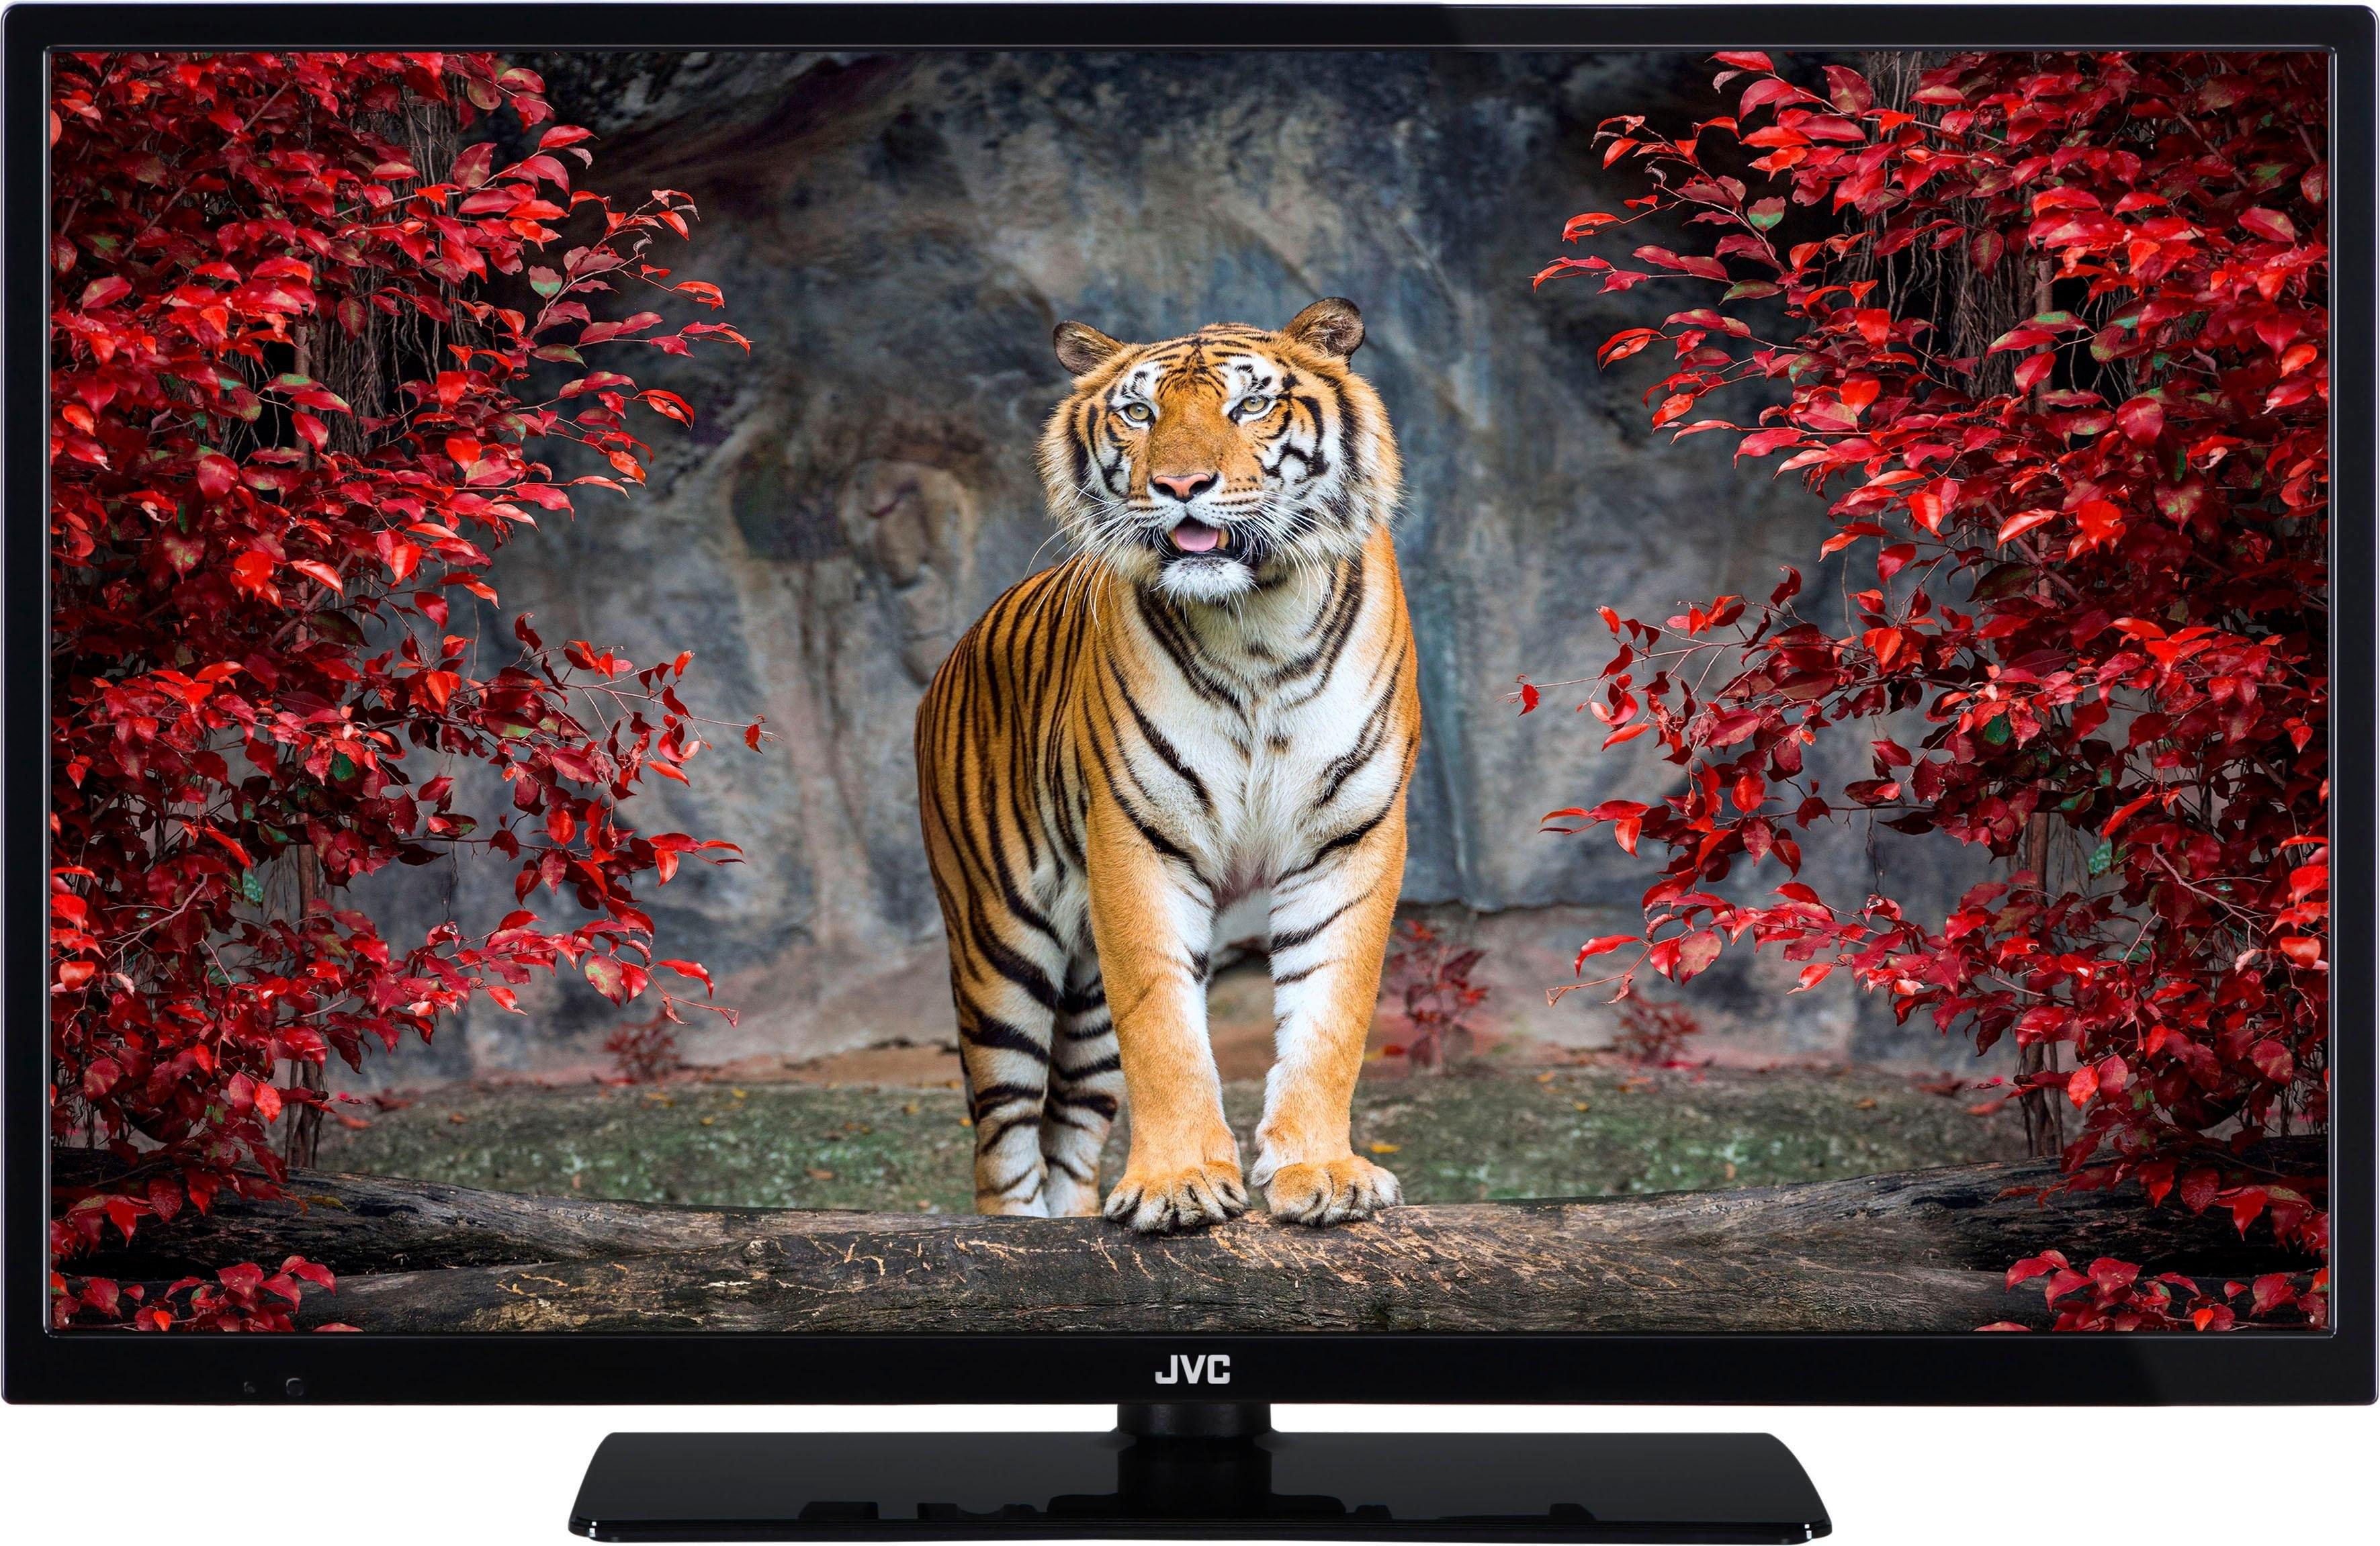 JVC LT-32V1000 led-tv (81 cm / 32 inch), HD-ready online kopen op otto.nl